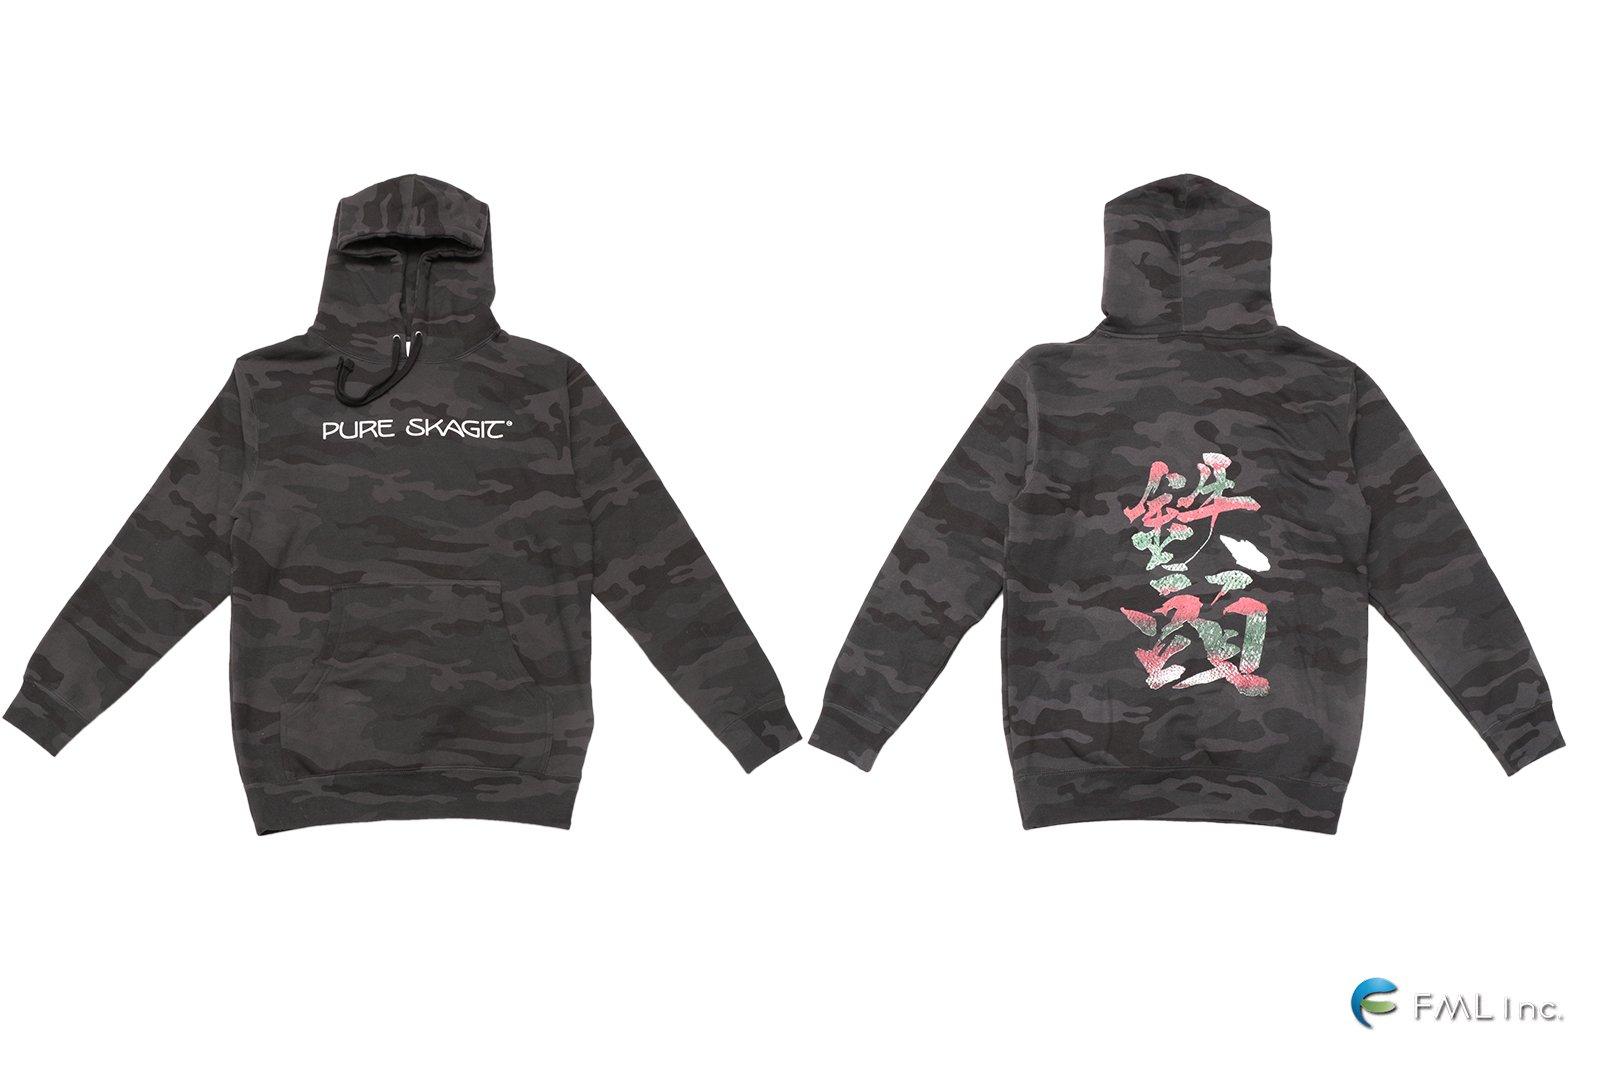 <img class='new_mark_img1' src='https://img.shop-pro.jp/img/new/icons5.gif' style='border:none;display:inline;margin:0px;padding:0px;width:auto;' />OPST Tetsu Atama Steelhead Hoodie (black camo pure skagit logo)